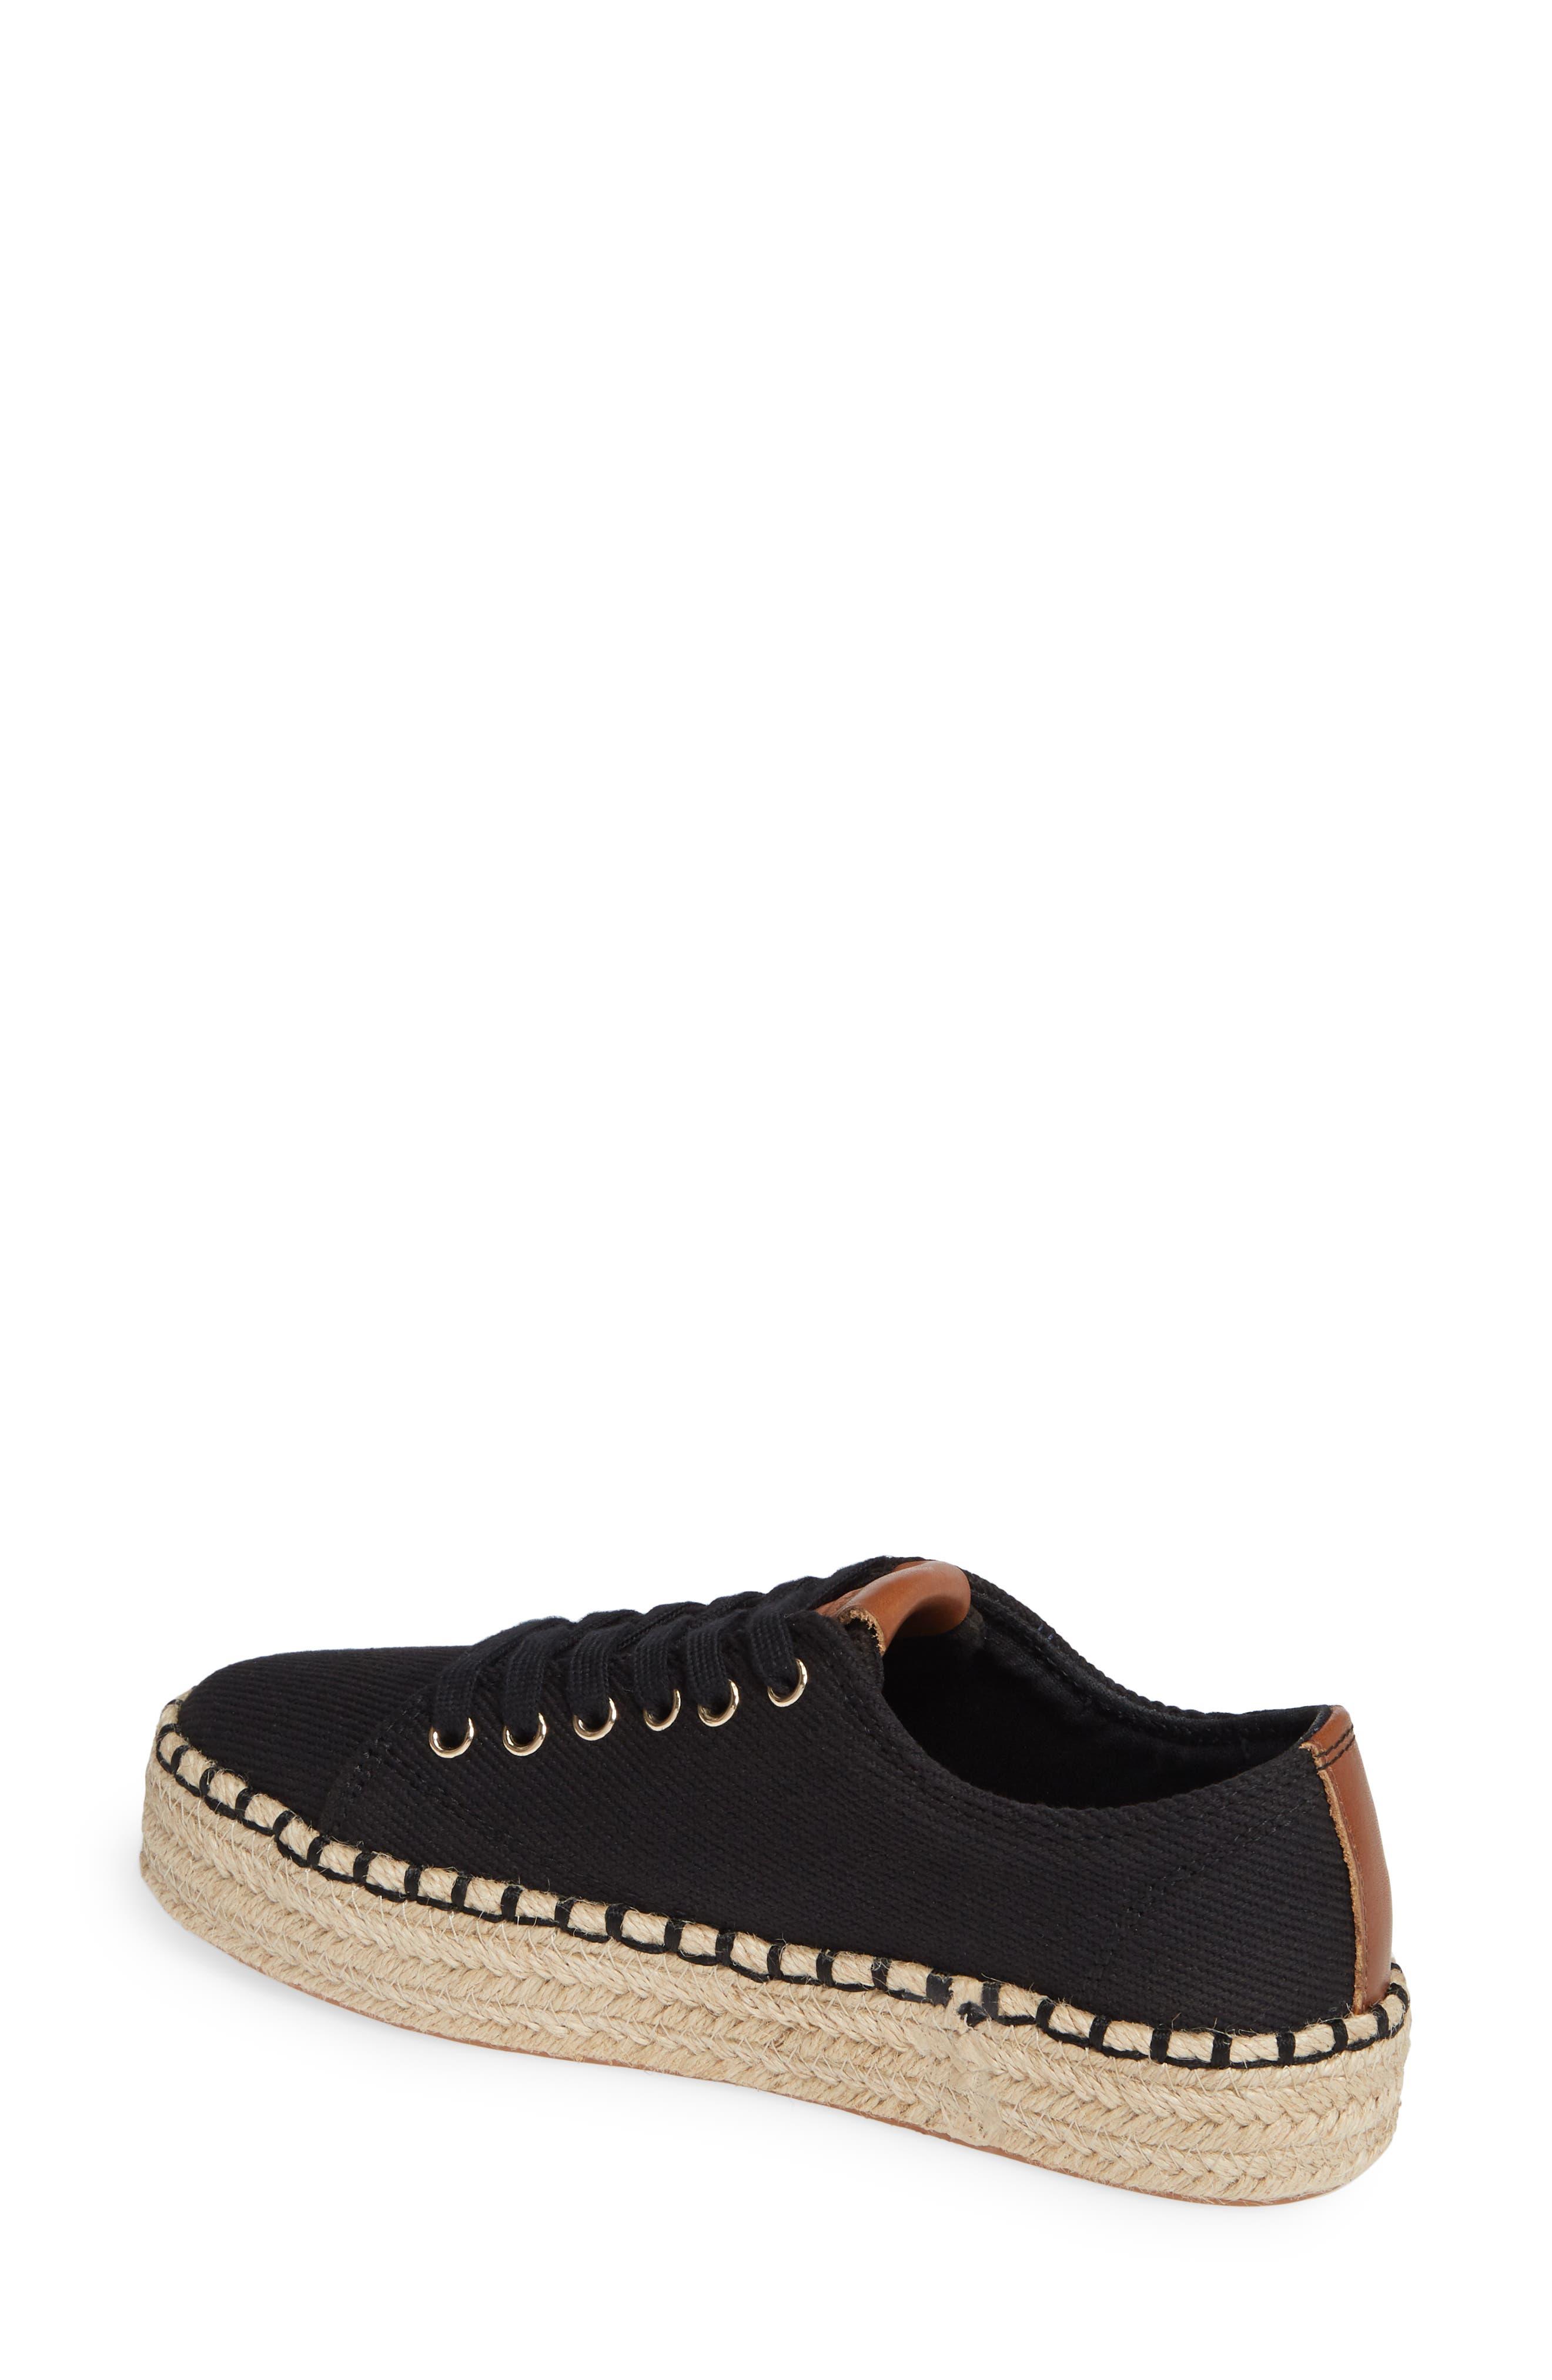 Platform Espadrille Sneaker,                             Alternate thumbnail 2, color,                             BLACK/ KONA TAN FABRIC